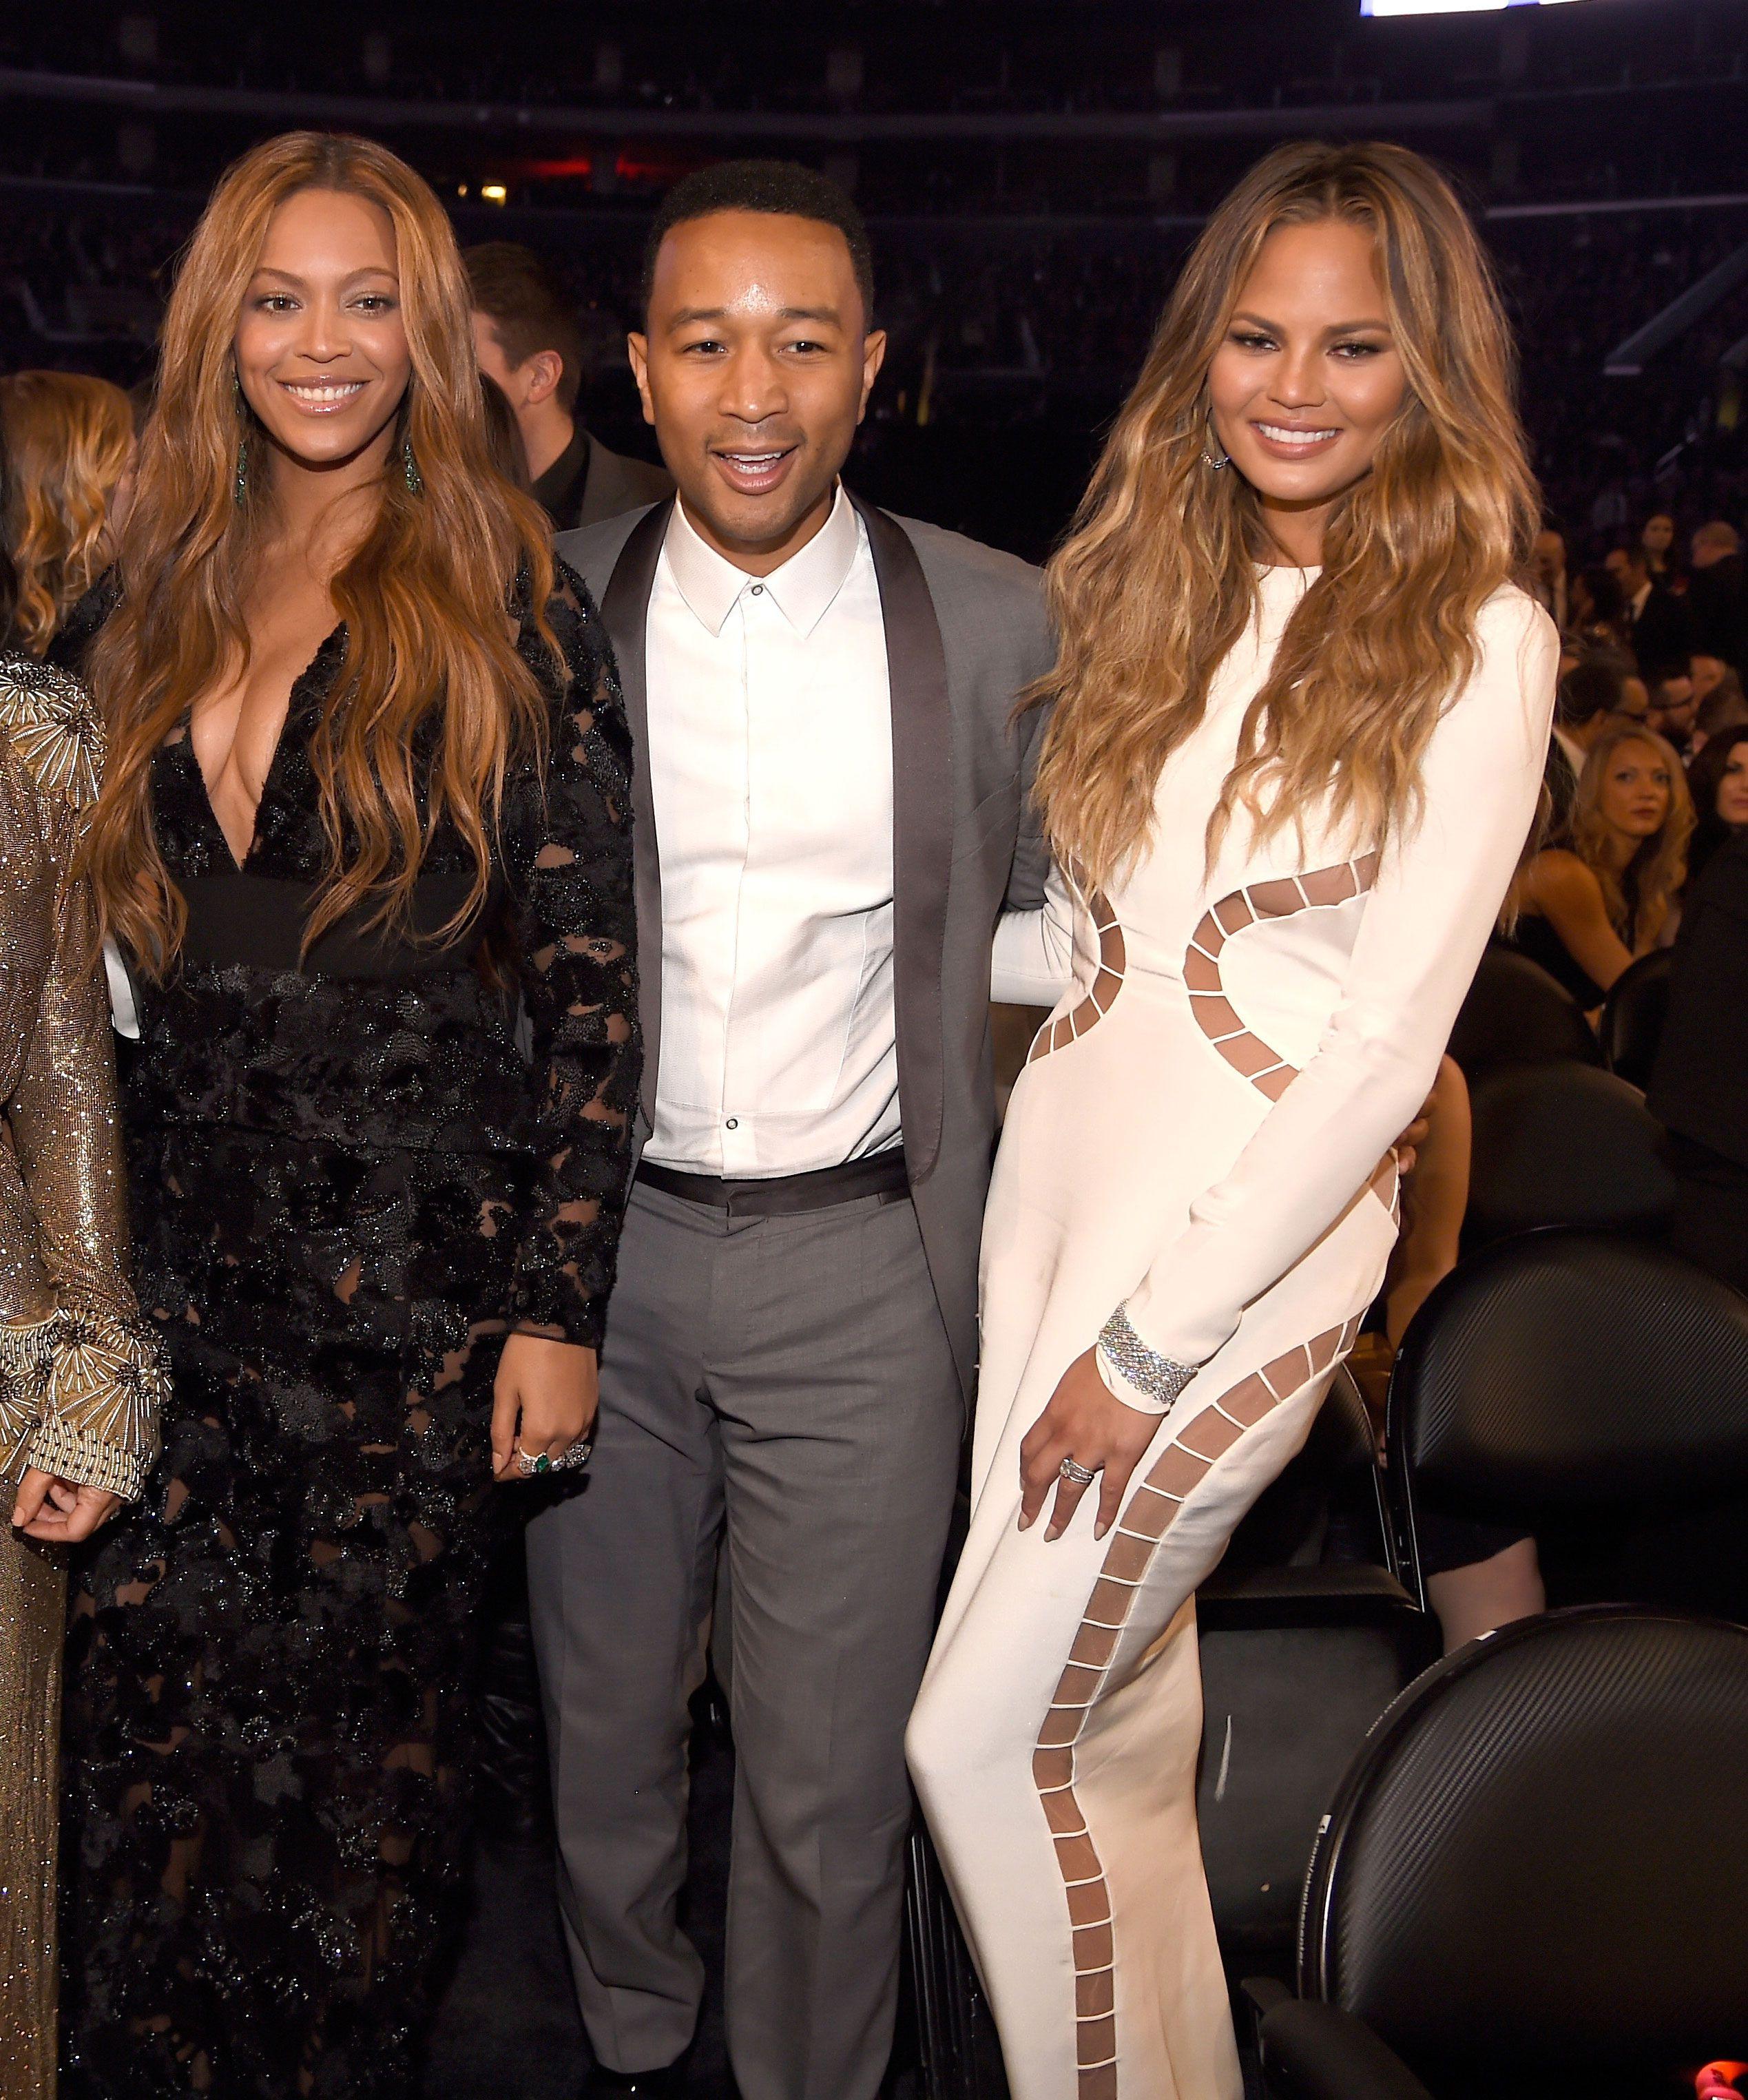 Chrissy Teigen Publicly Apologized to Beyoncé for Oscar Party Behavior